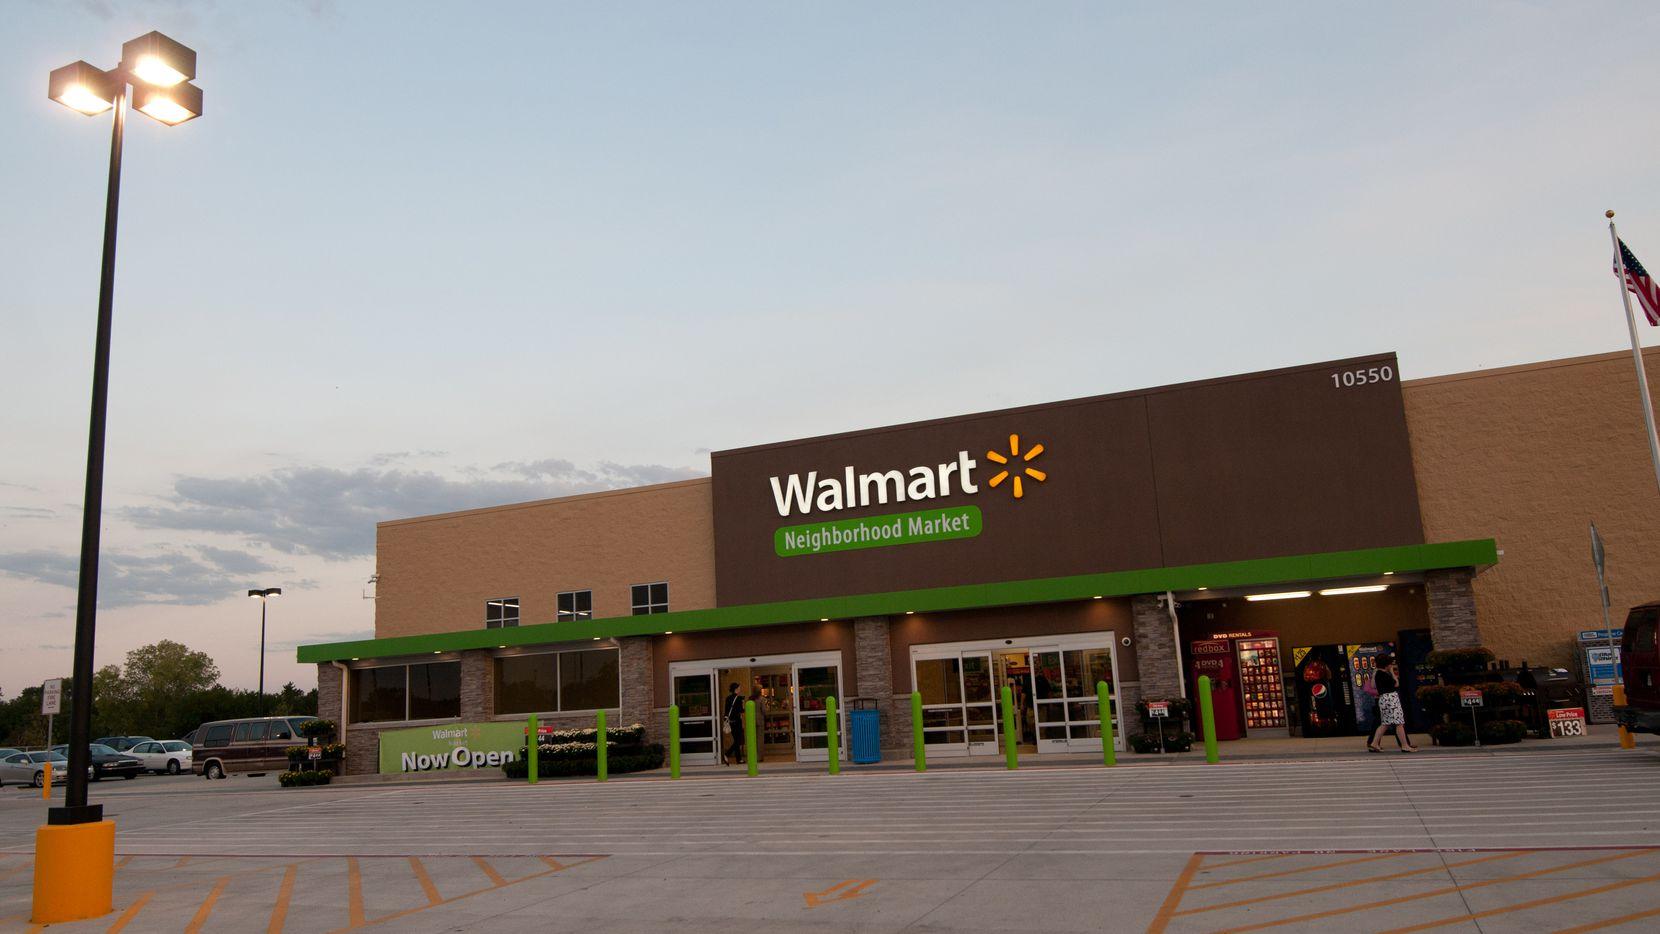 A Walmart Neighborhood Market located in Jacksonville, Fla.